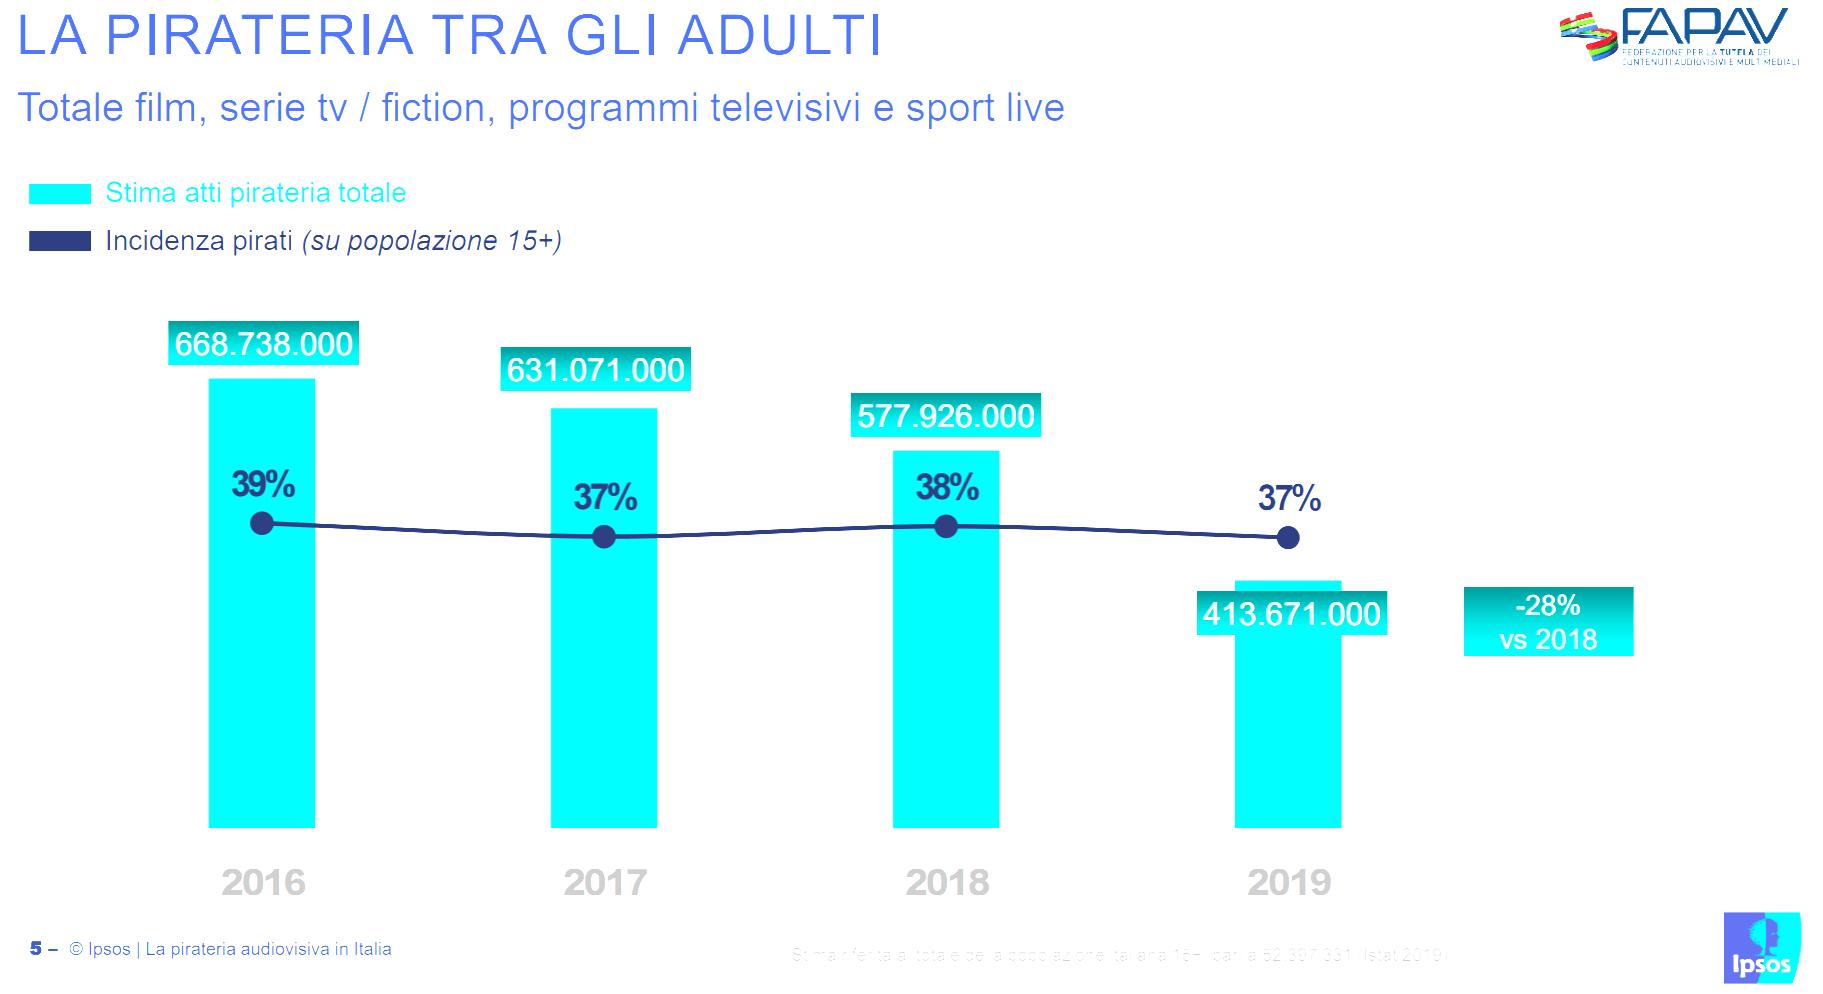 Italy Piracy Rates 2019